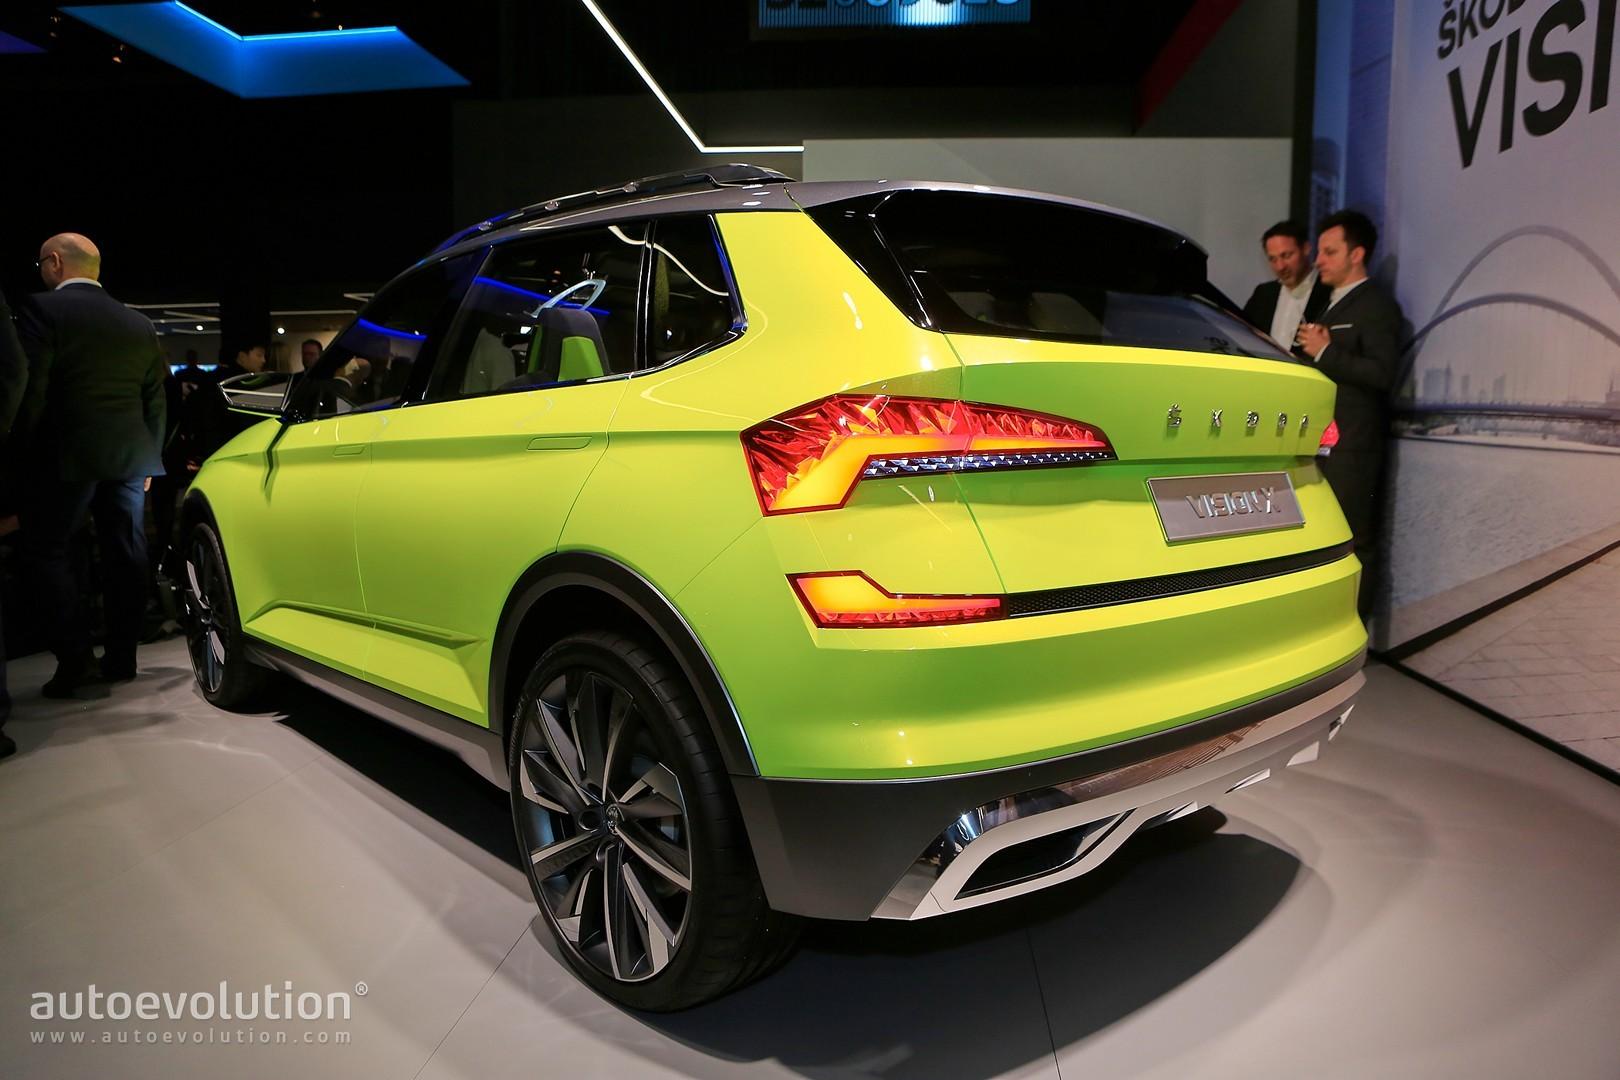 New skoda vision x small suv will debut at 2019 geneva motor show autoevolution - Geneva car show ...